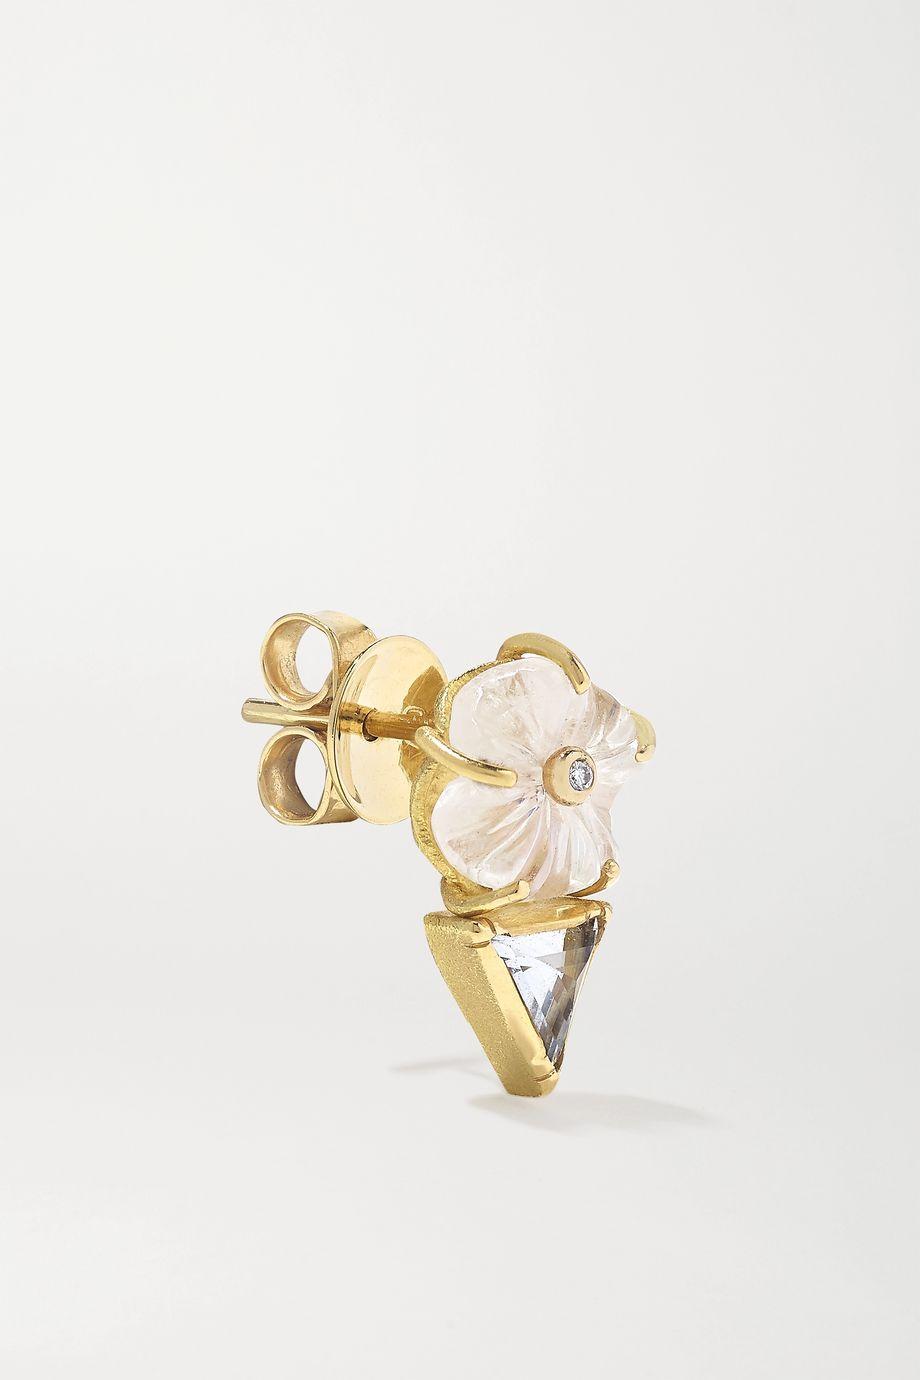 Brooke Gregson Blossom 18-karat gold multi-stone earrings